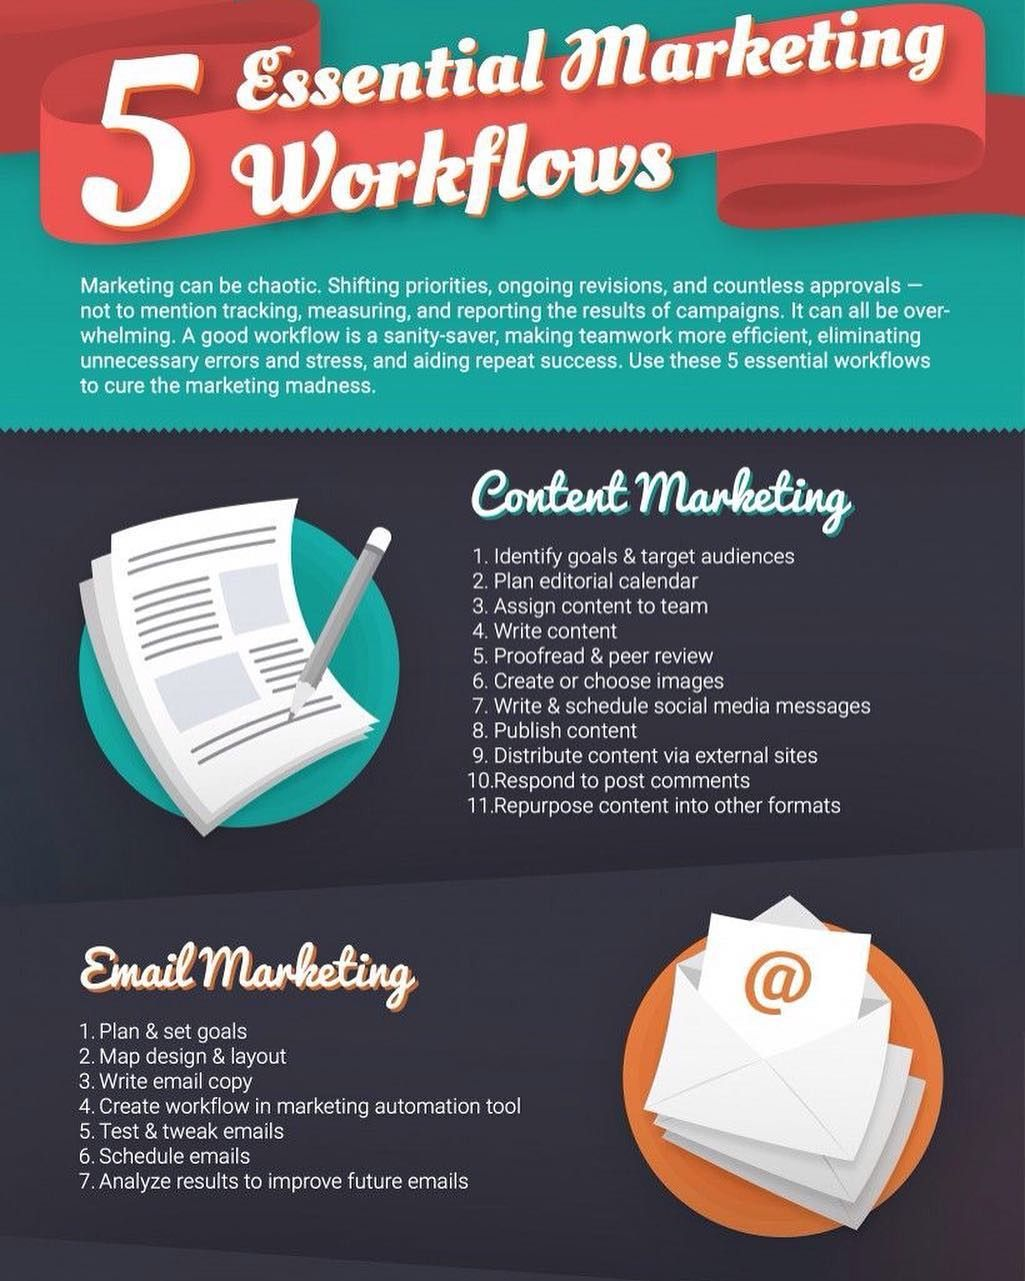 Instagram Photo By Curtis Sheppard Jul 28 2016 At 11 48pm Utc Marketing Essentials Content Marketing Marketing